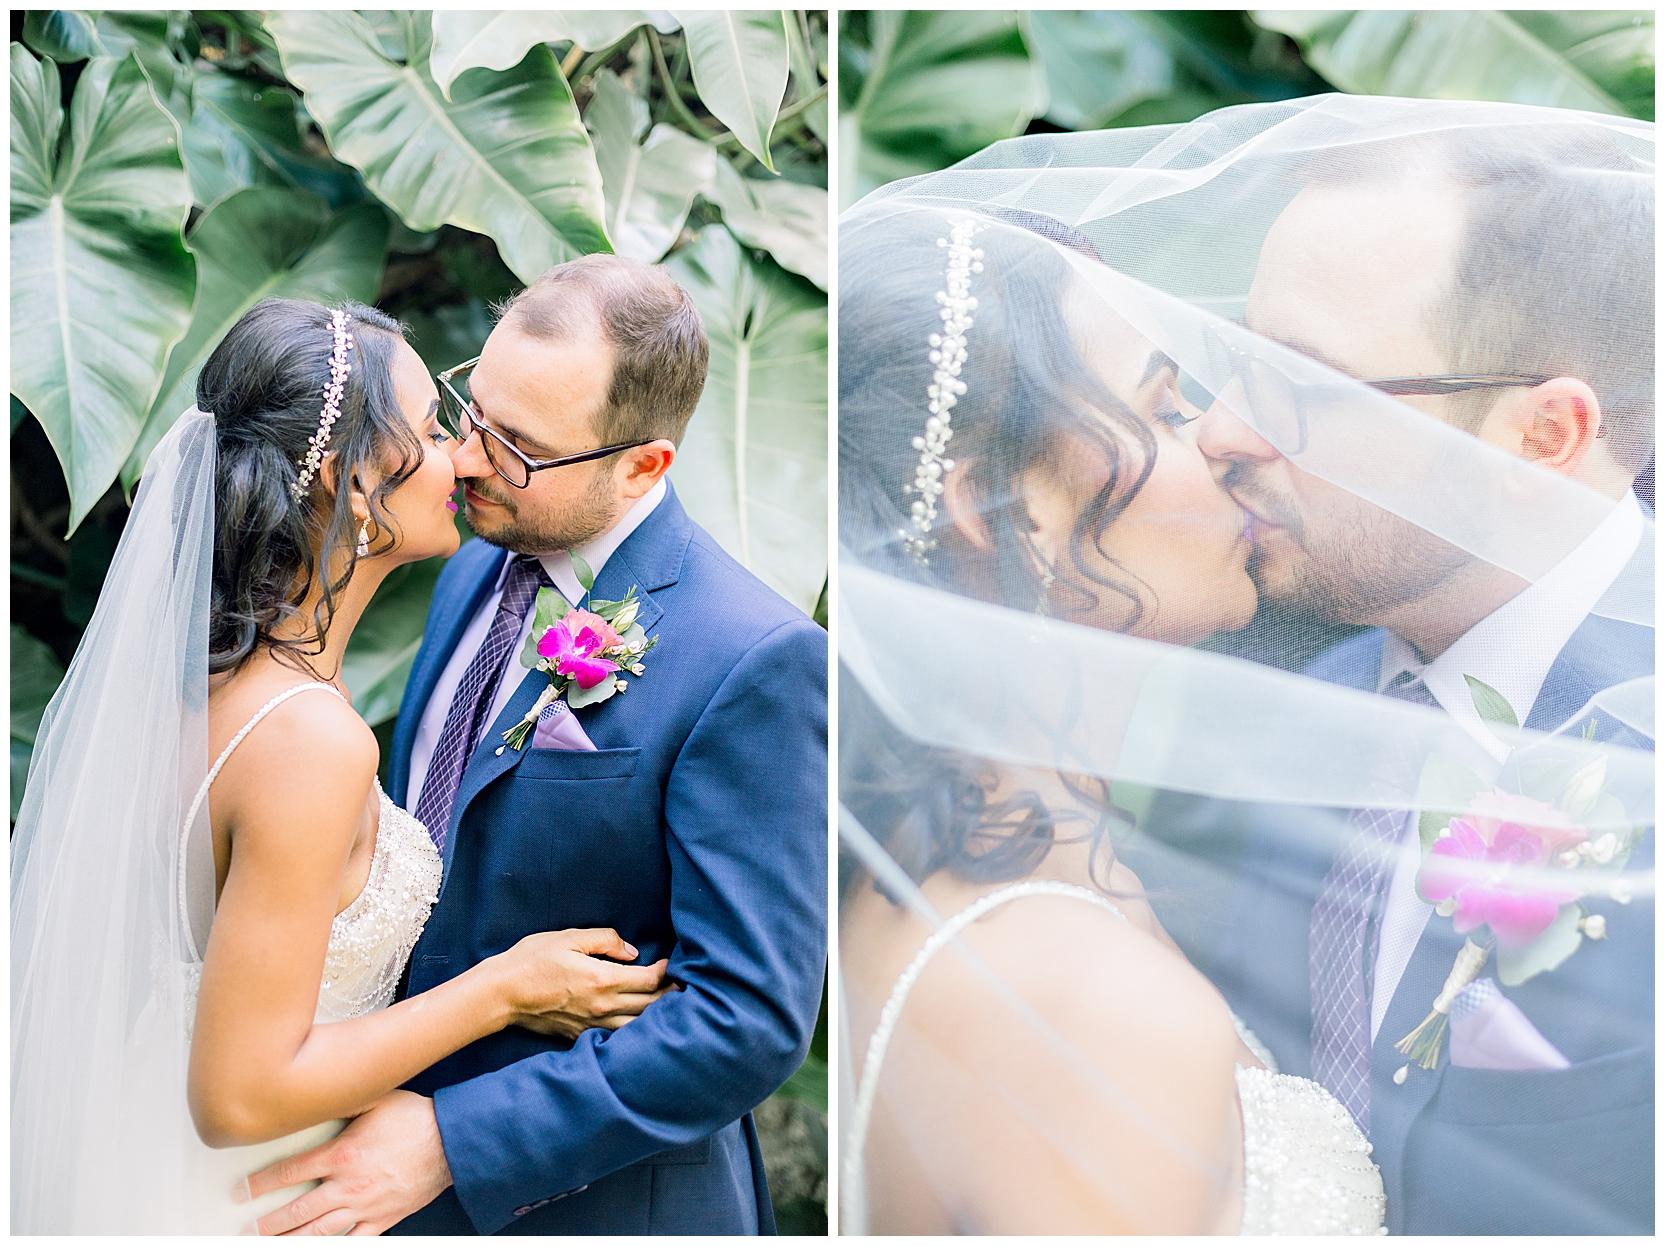 jessicafredericks_lakeland_tampa_wedding_purple_crazy hour_0022.jpg